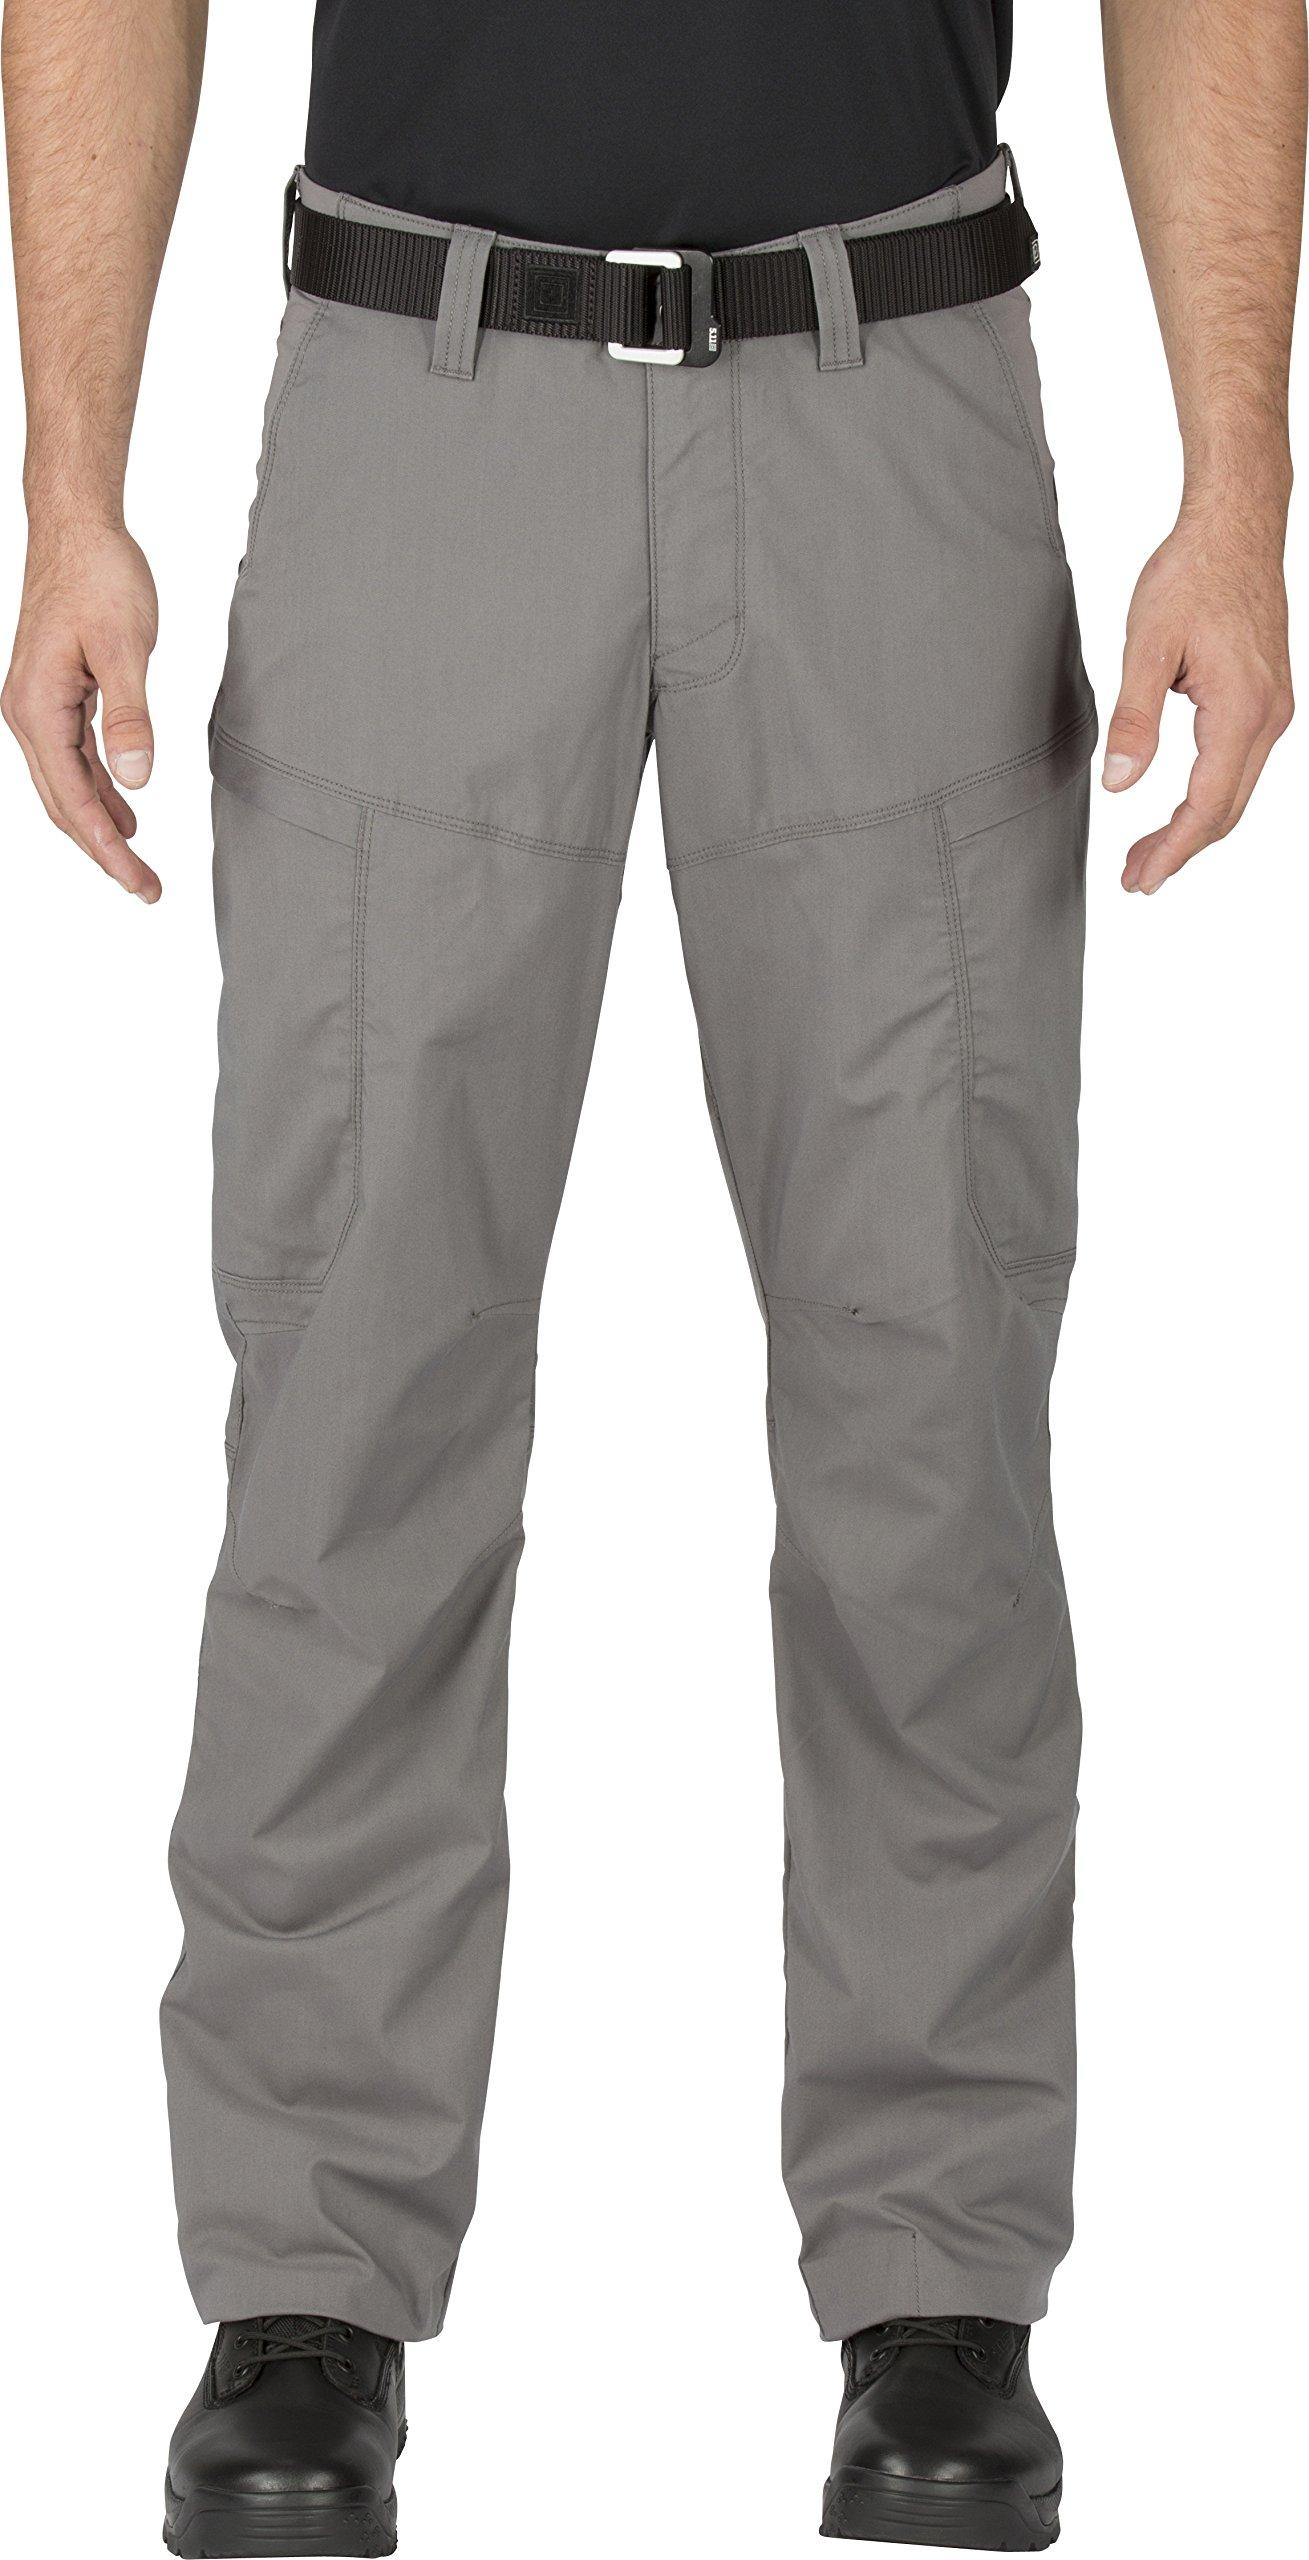 5.11 Men's APEX EDC Stealth Cargo Pocket Tactical Pant Style 74434, Storm, 28W x 34L